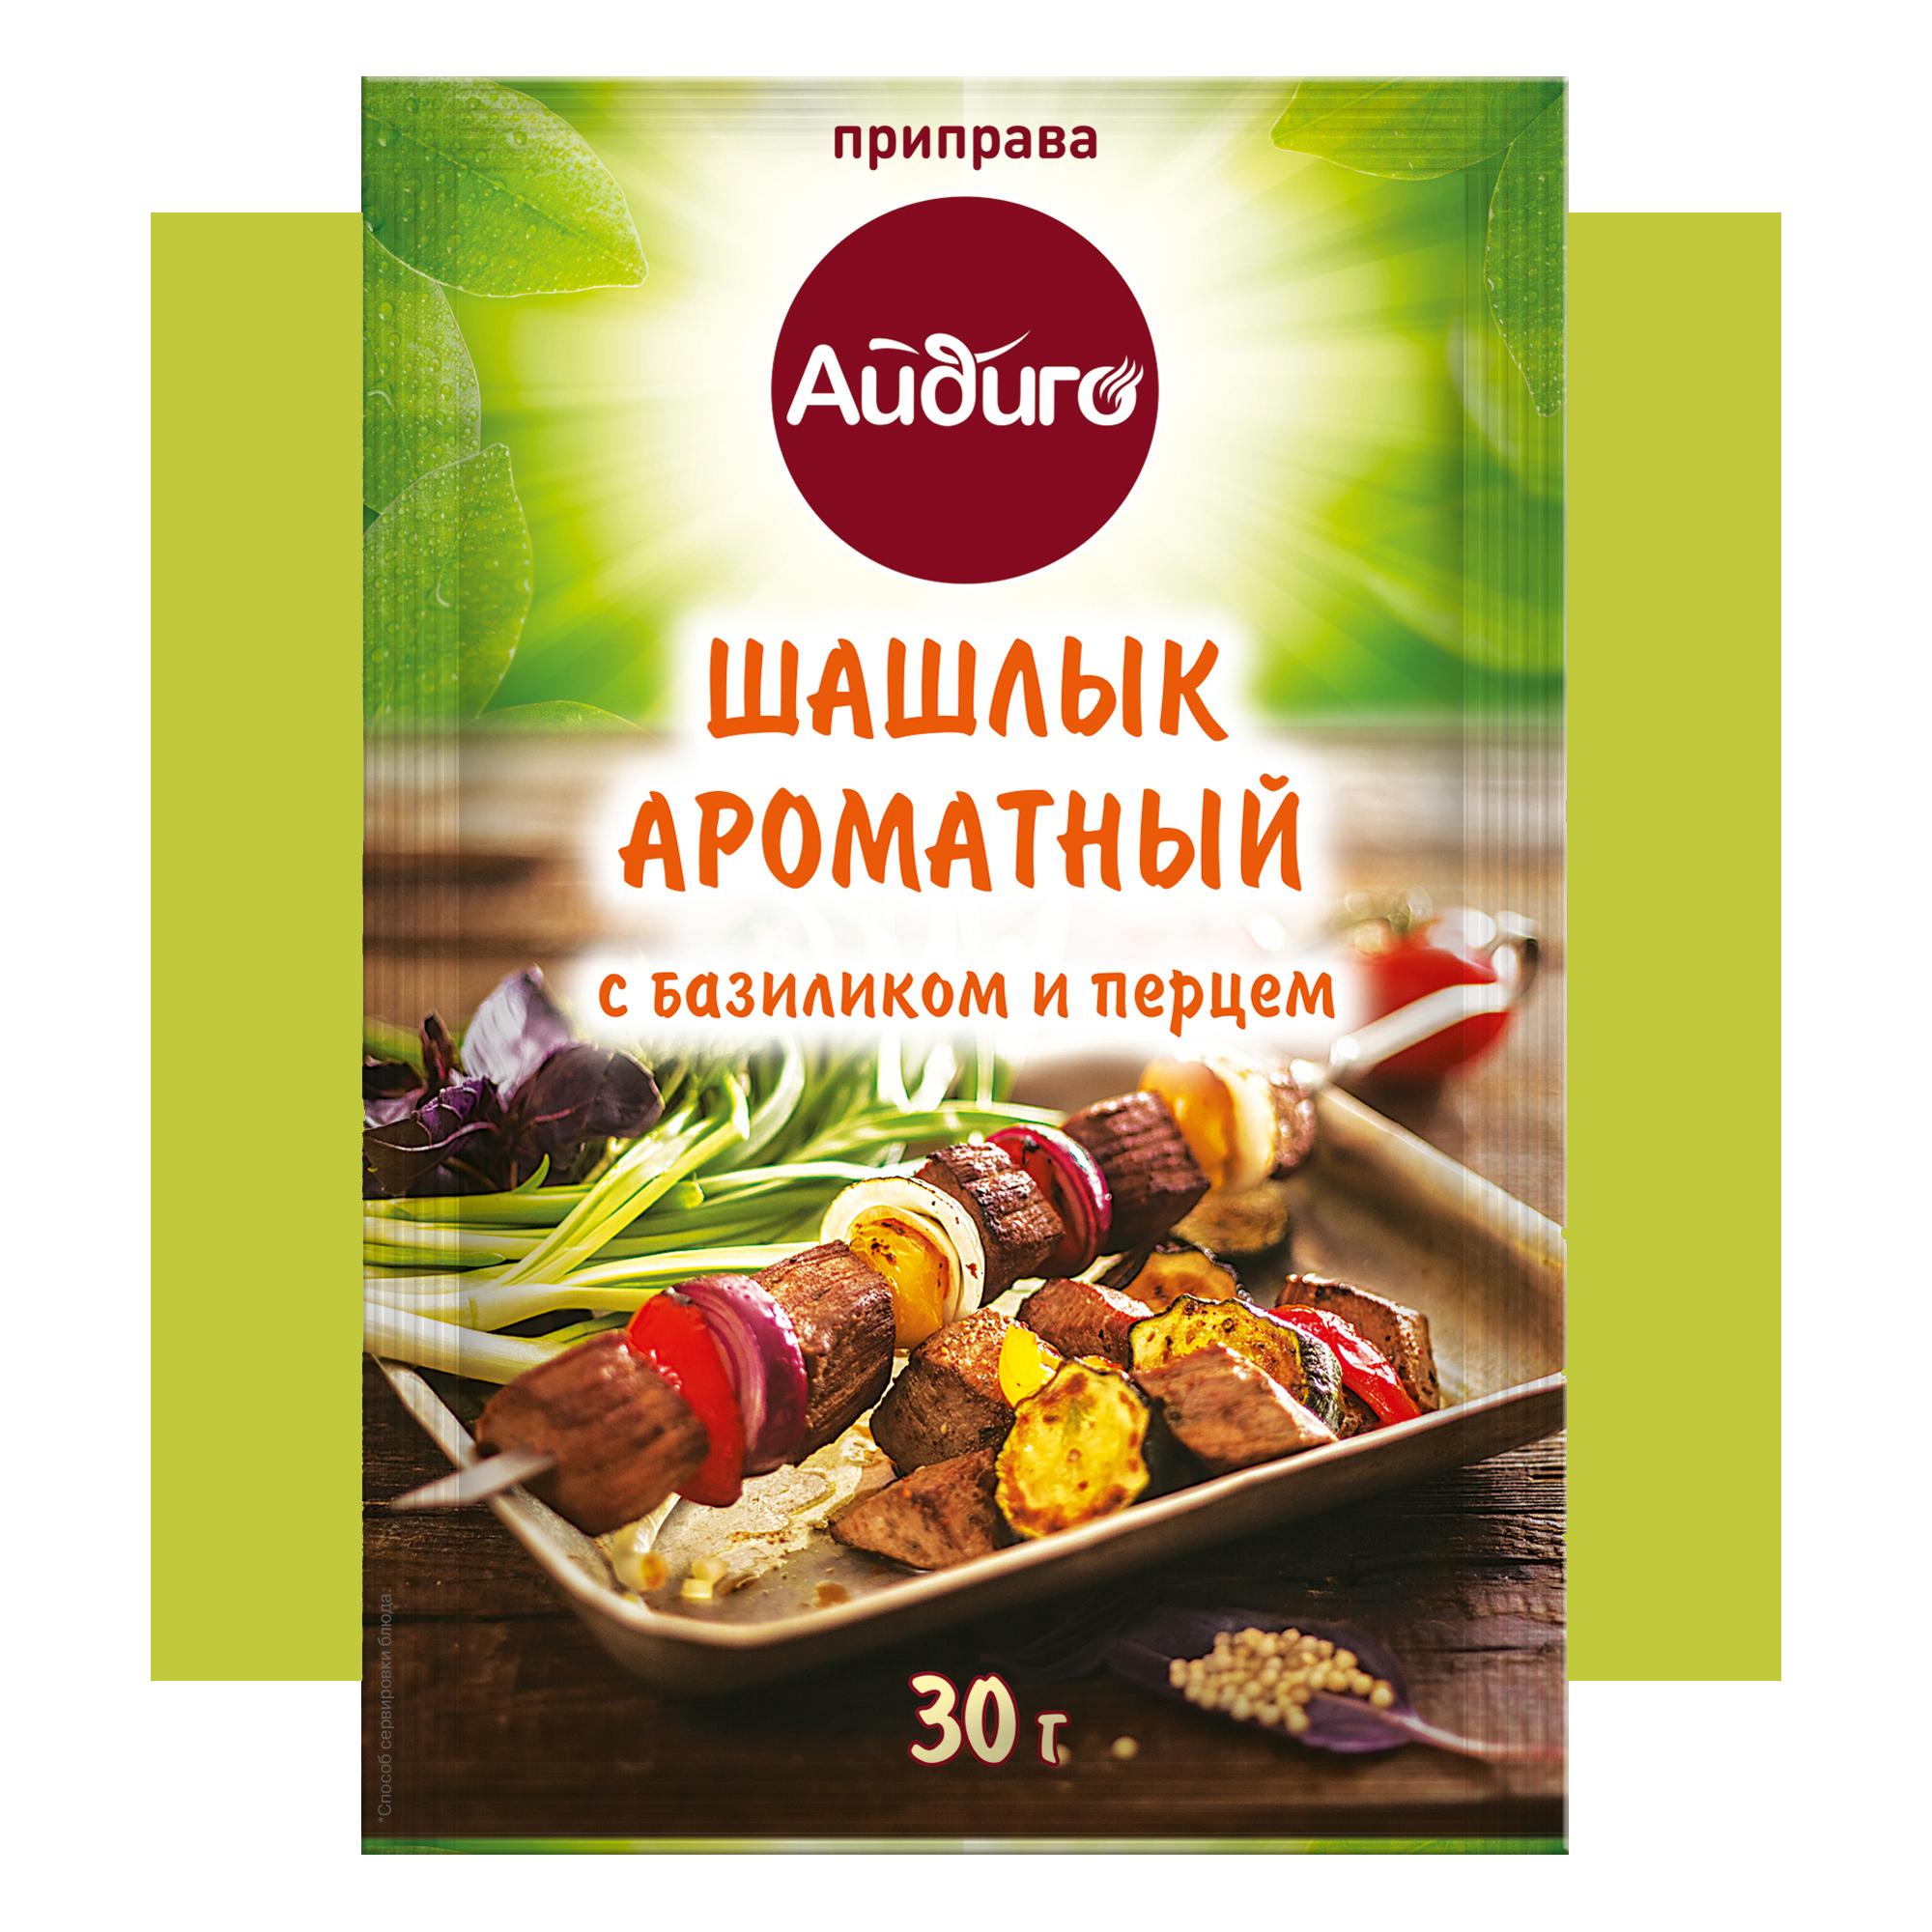 A003 - Aidigo barbecue seasoning with basil 30g